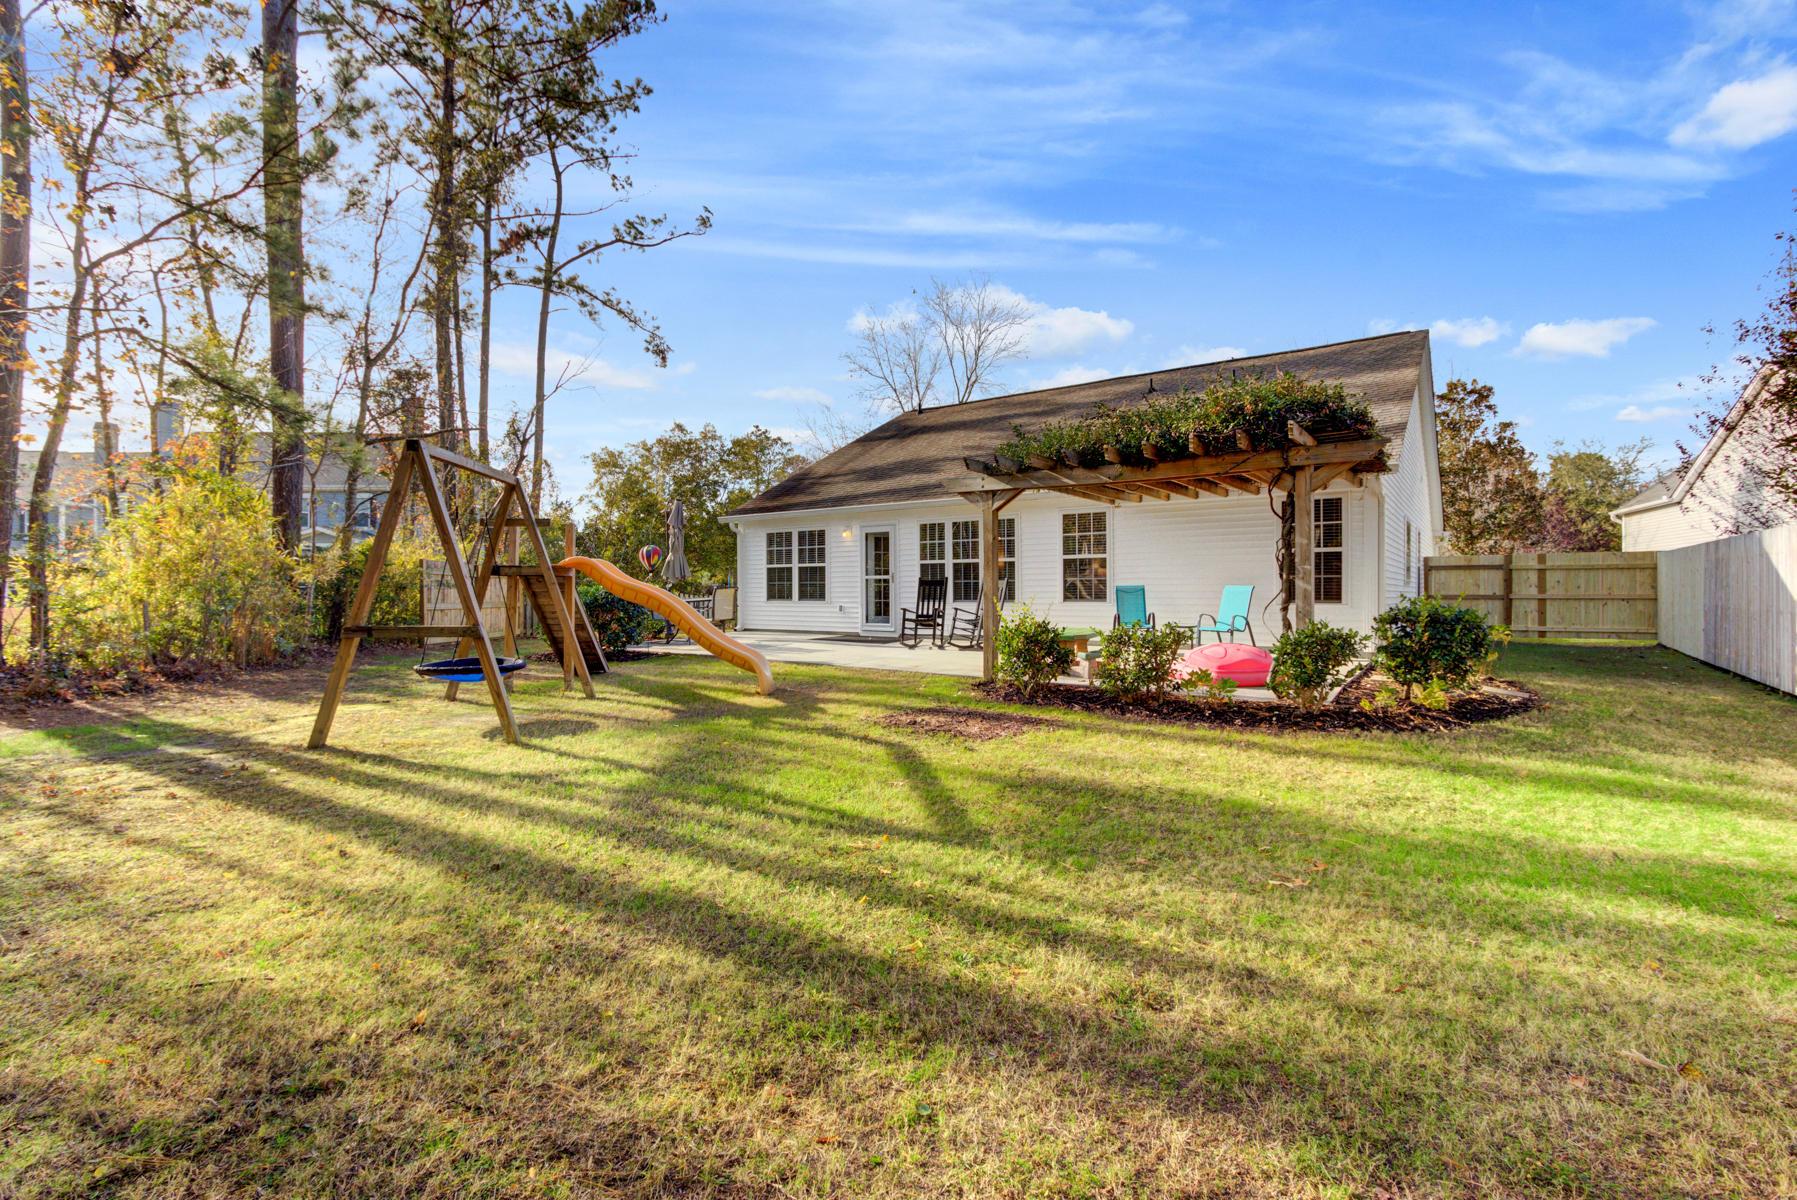 Park West Homes For Sale - 3444 Wellesley, Mount Pleasant, SC - 2